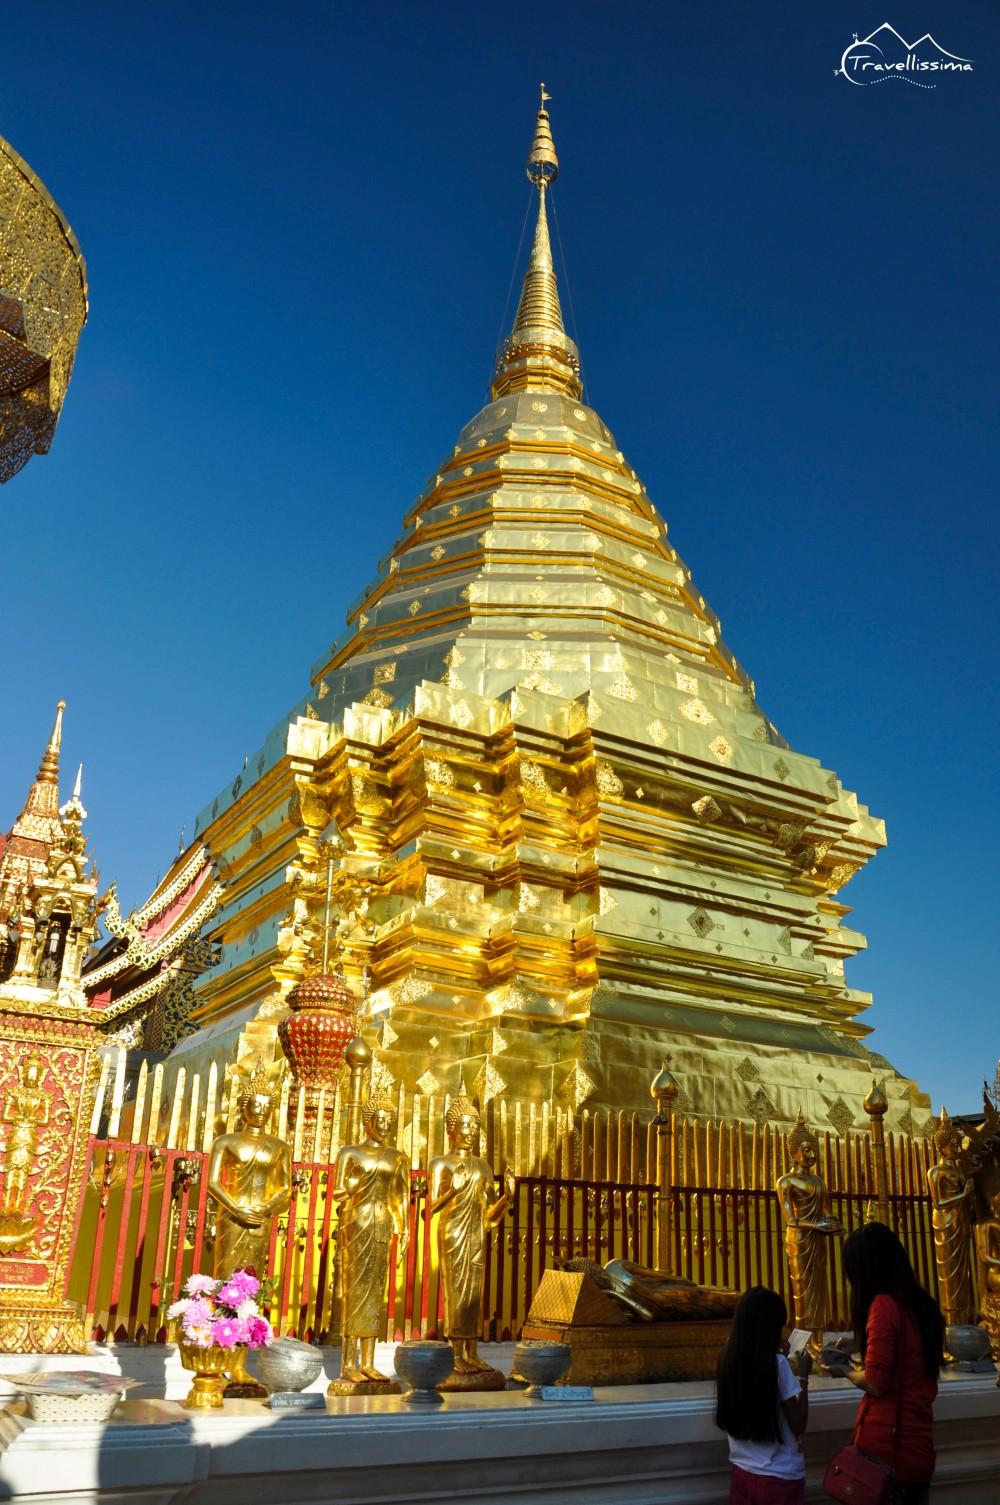 Chiang_Mai_Anna_Kedzierska_Travellissima-0761